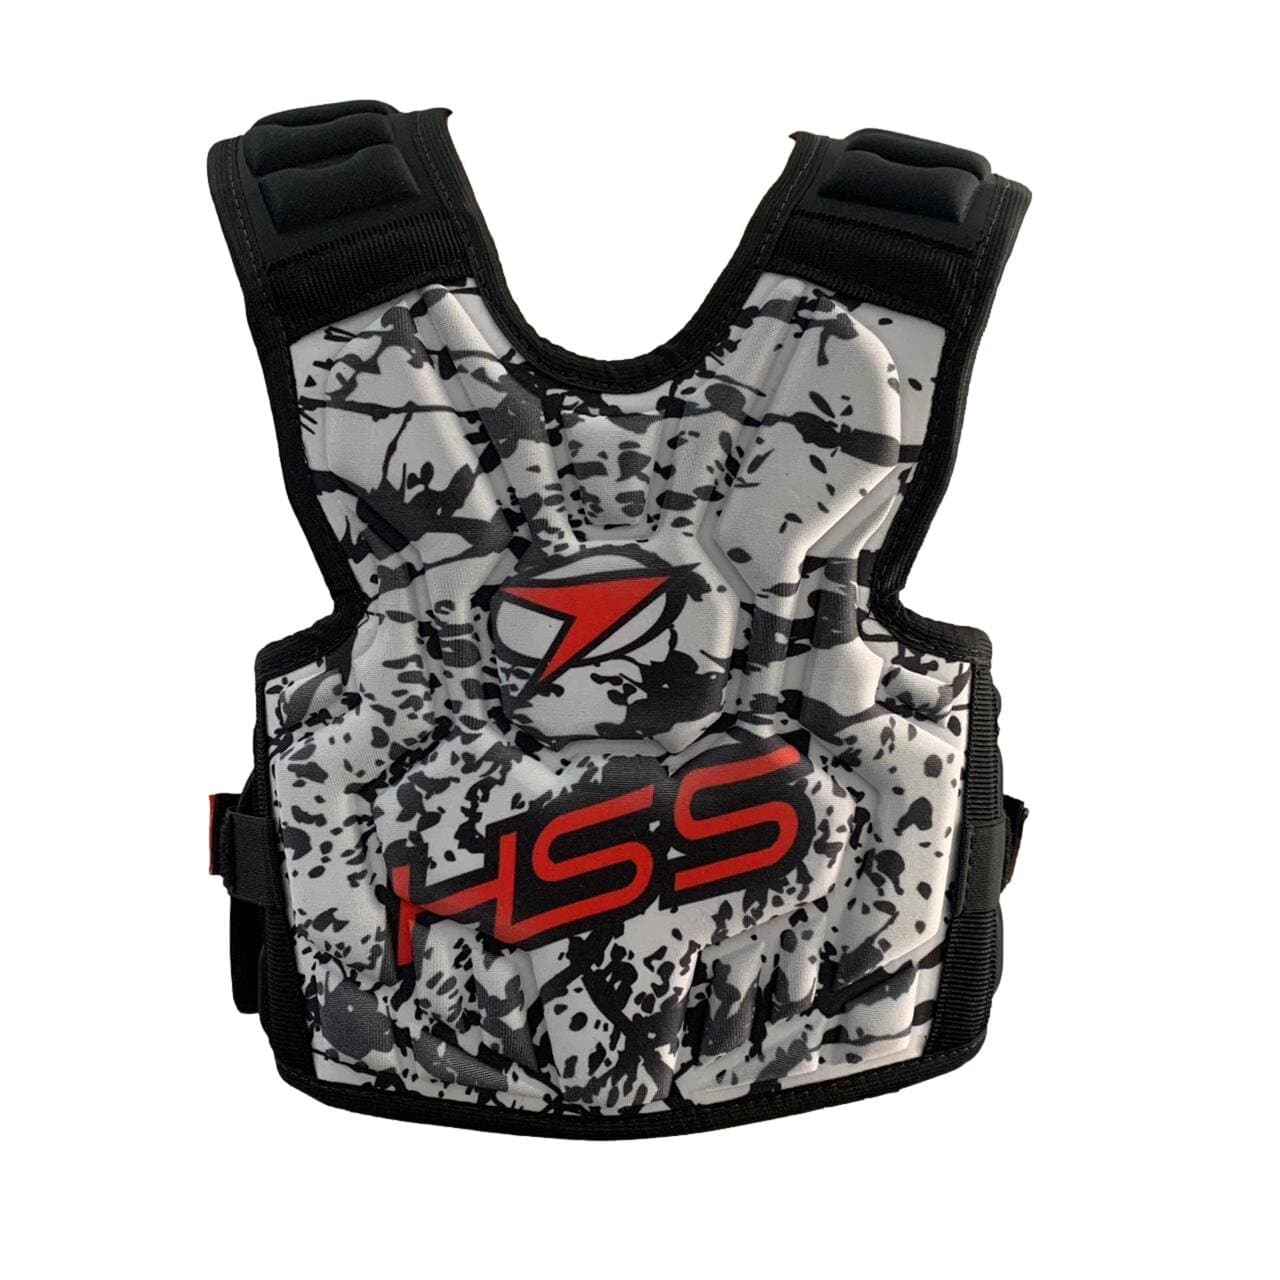 Colete Infantil HSS Shock Armor Cross Action